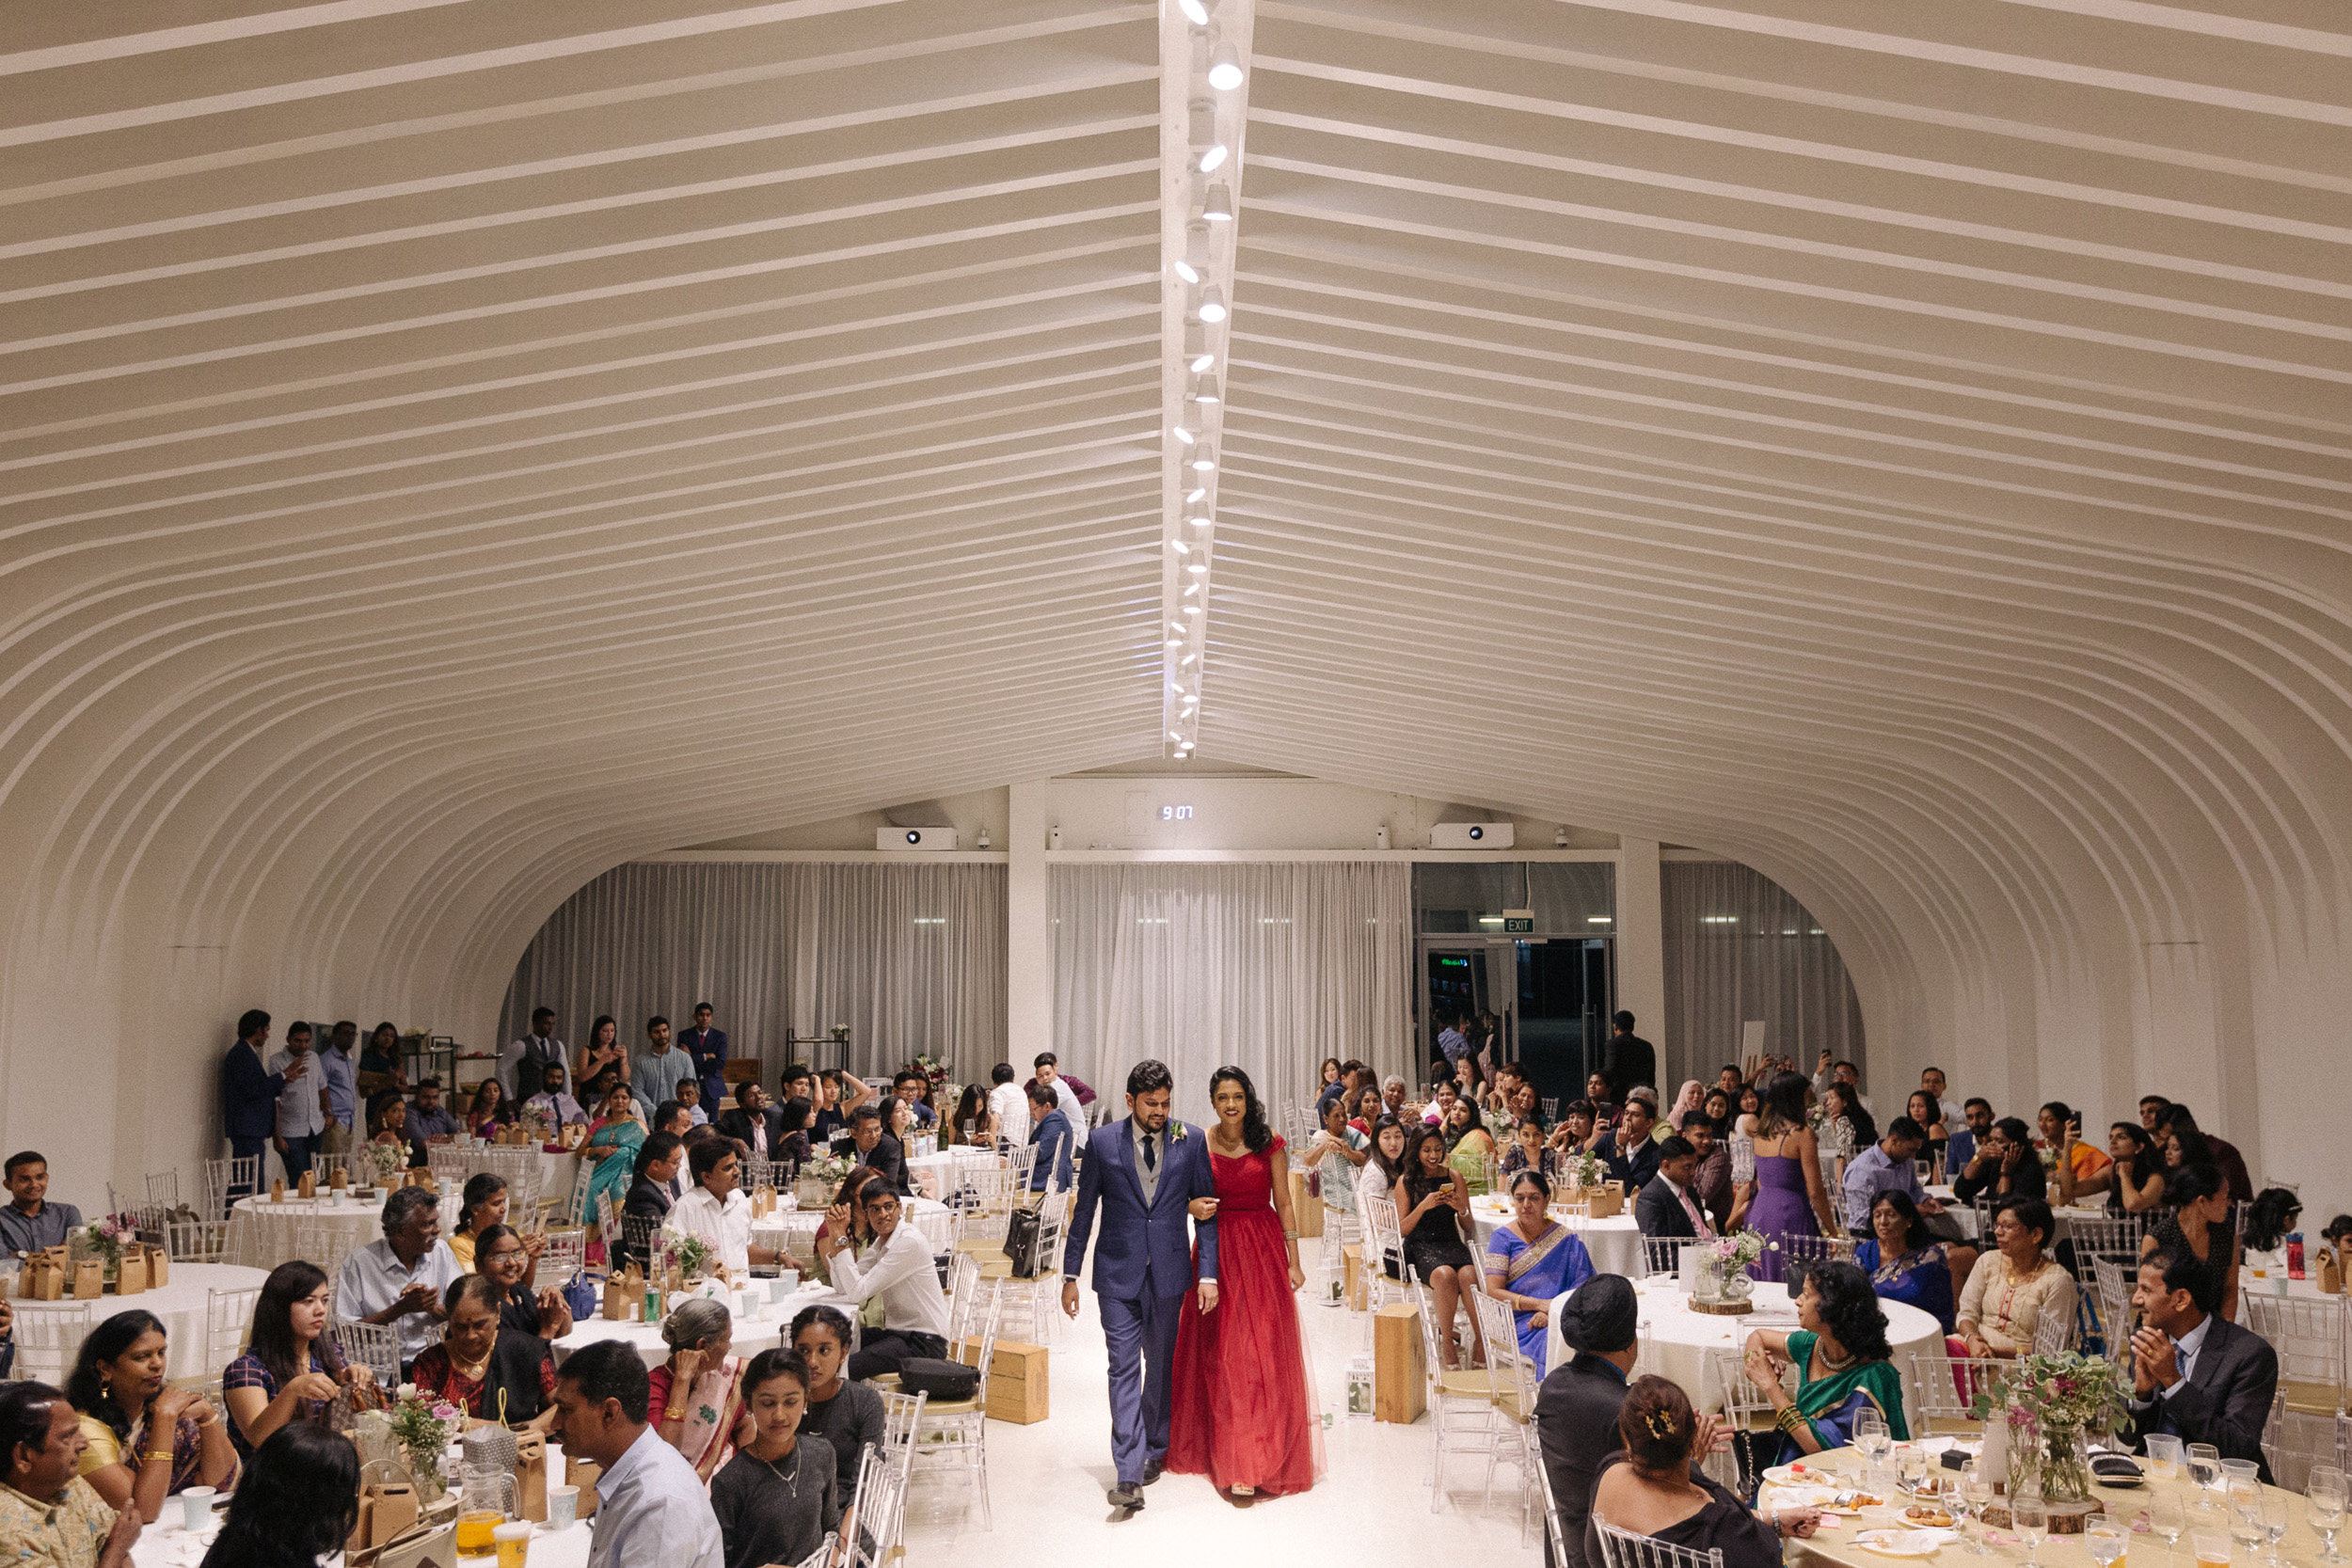 singapore-wedding-photographer-photography-wmt2017-095.jpg